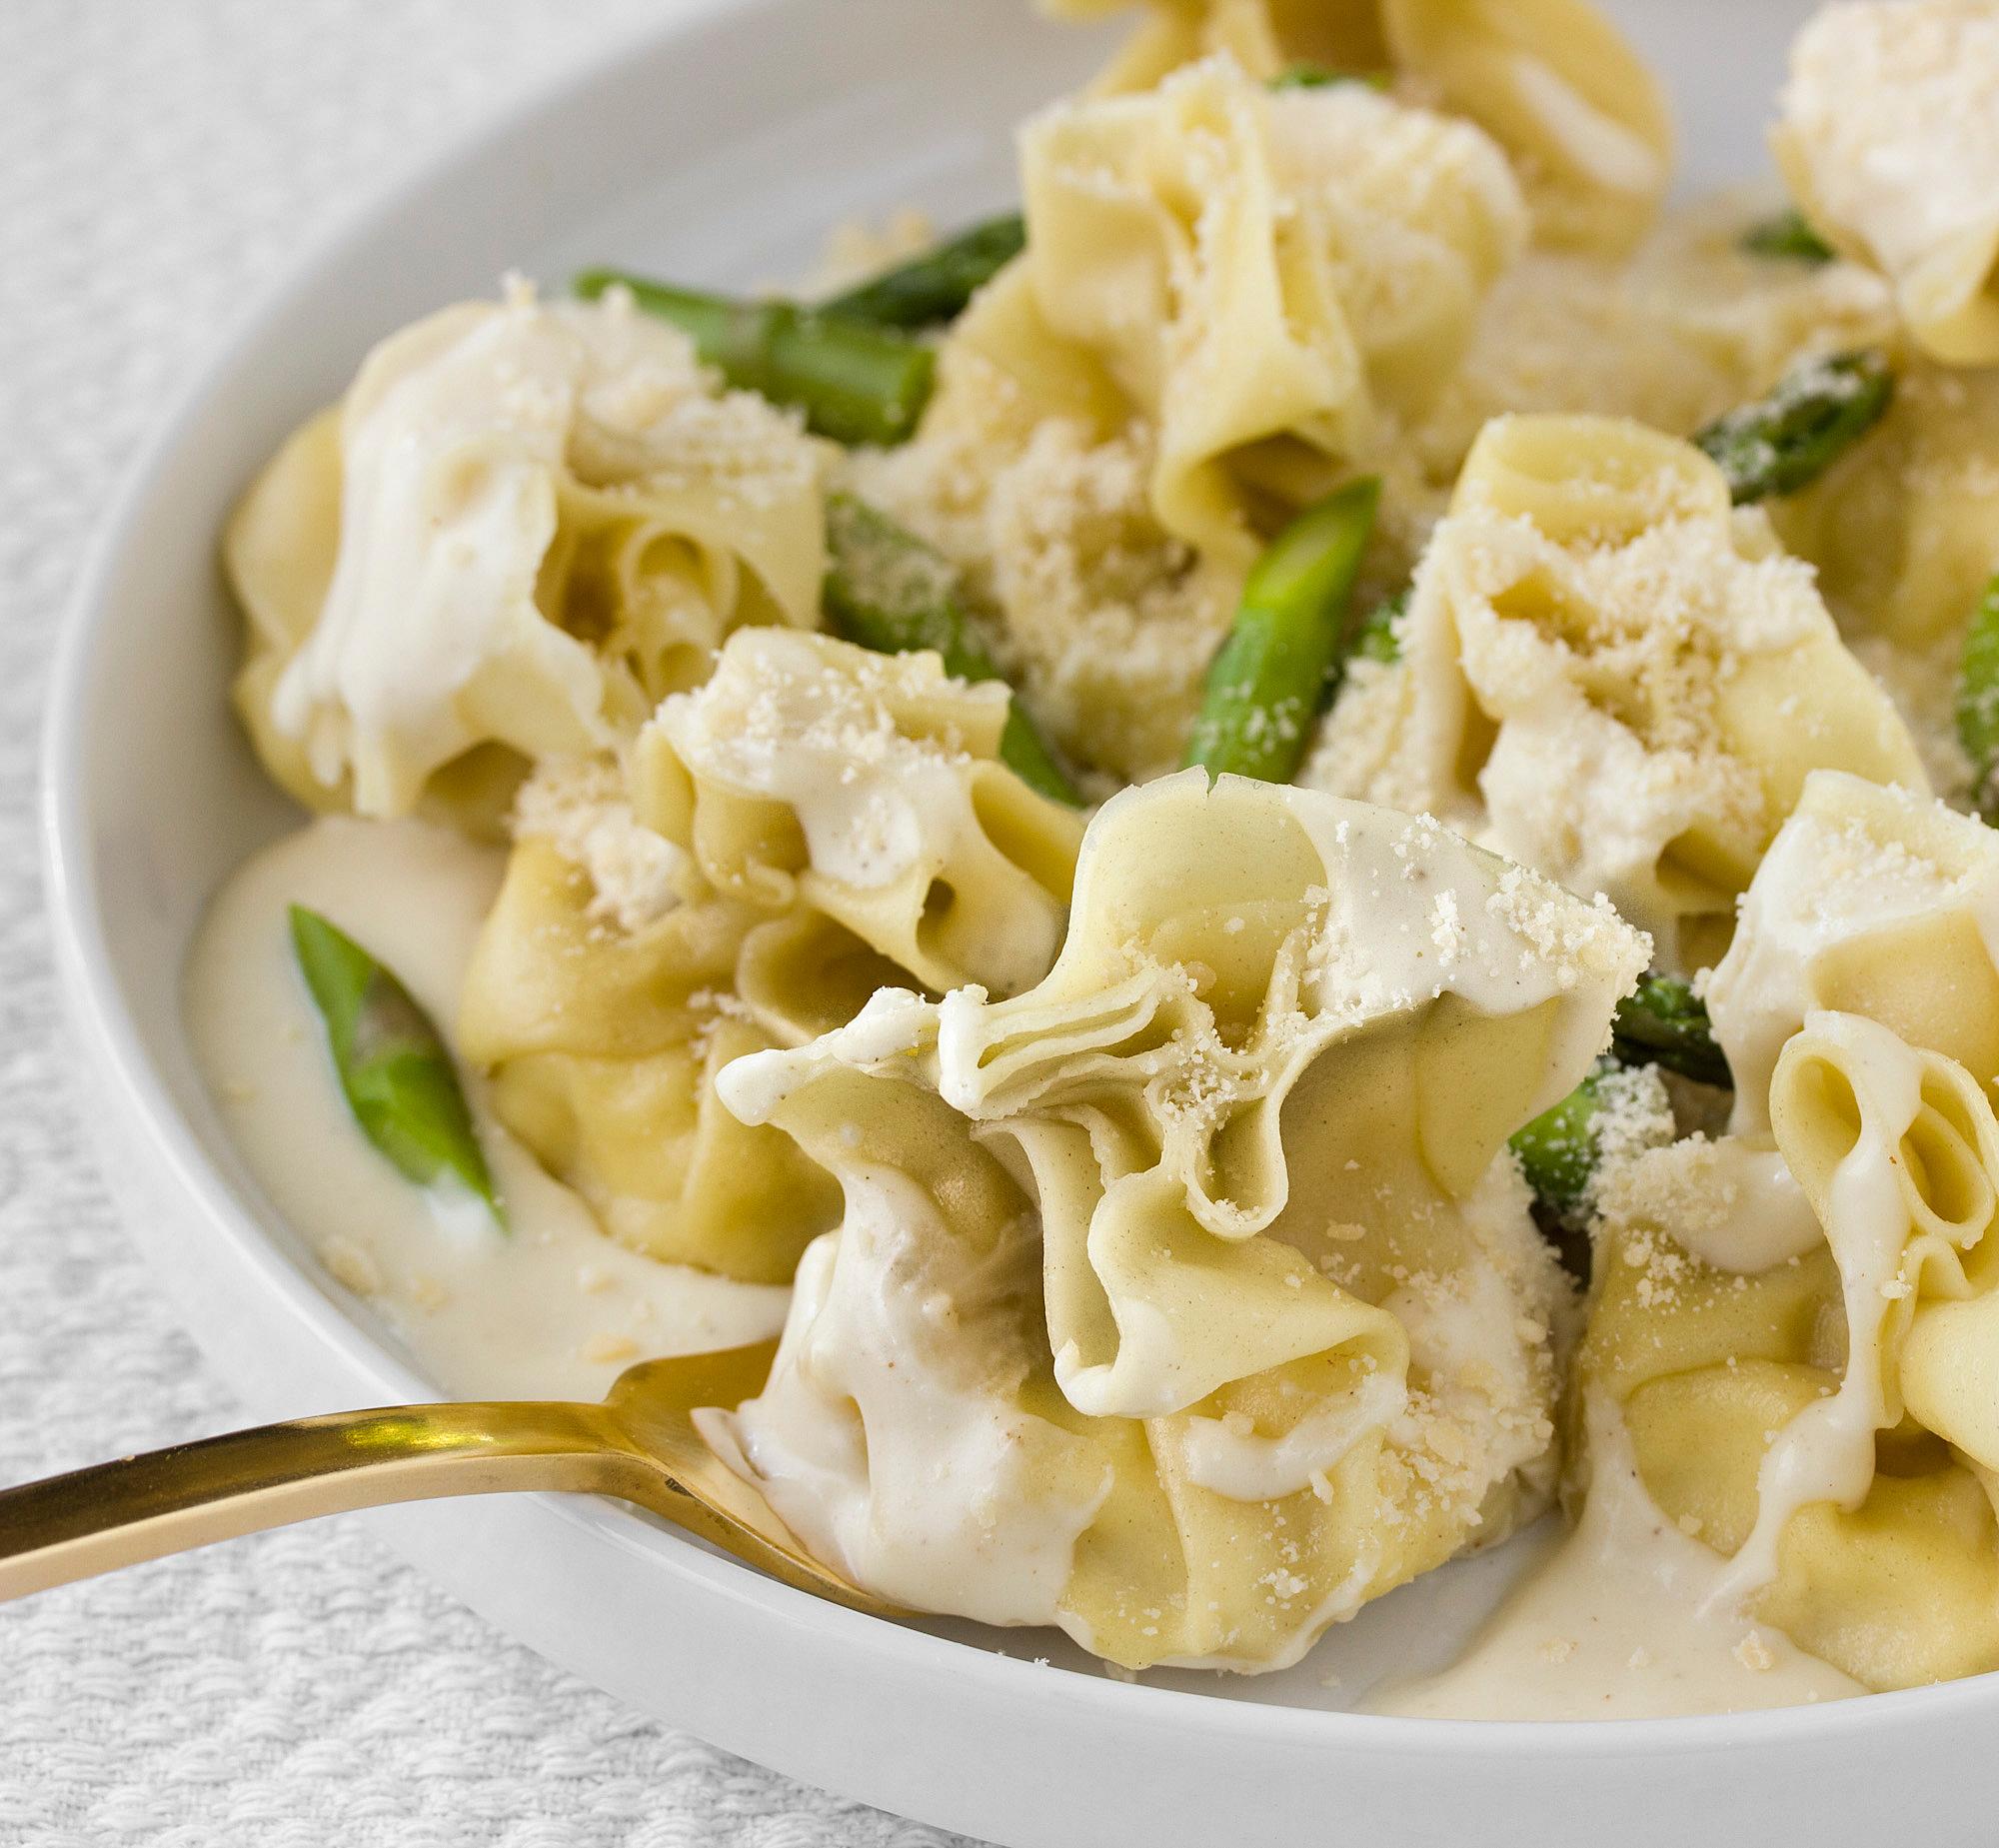 Italian Recipe: Fiocchetti with Pears and Parmesan Cream | Kitchn